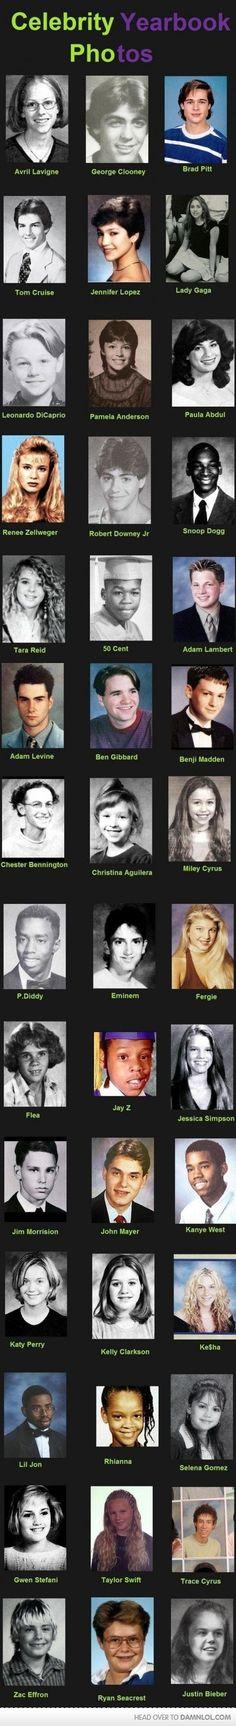 Celebrity Yearbook Photos